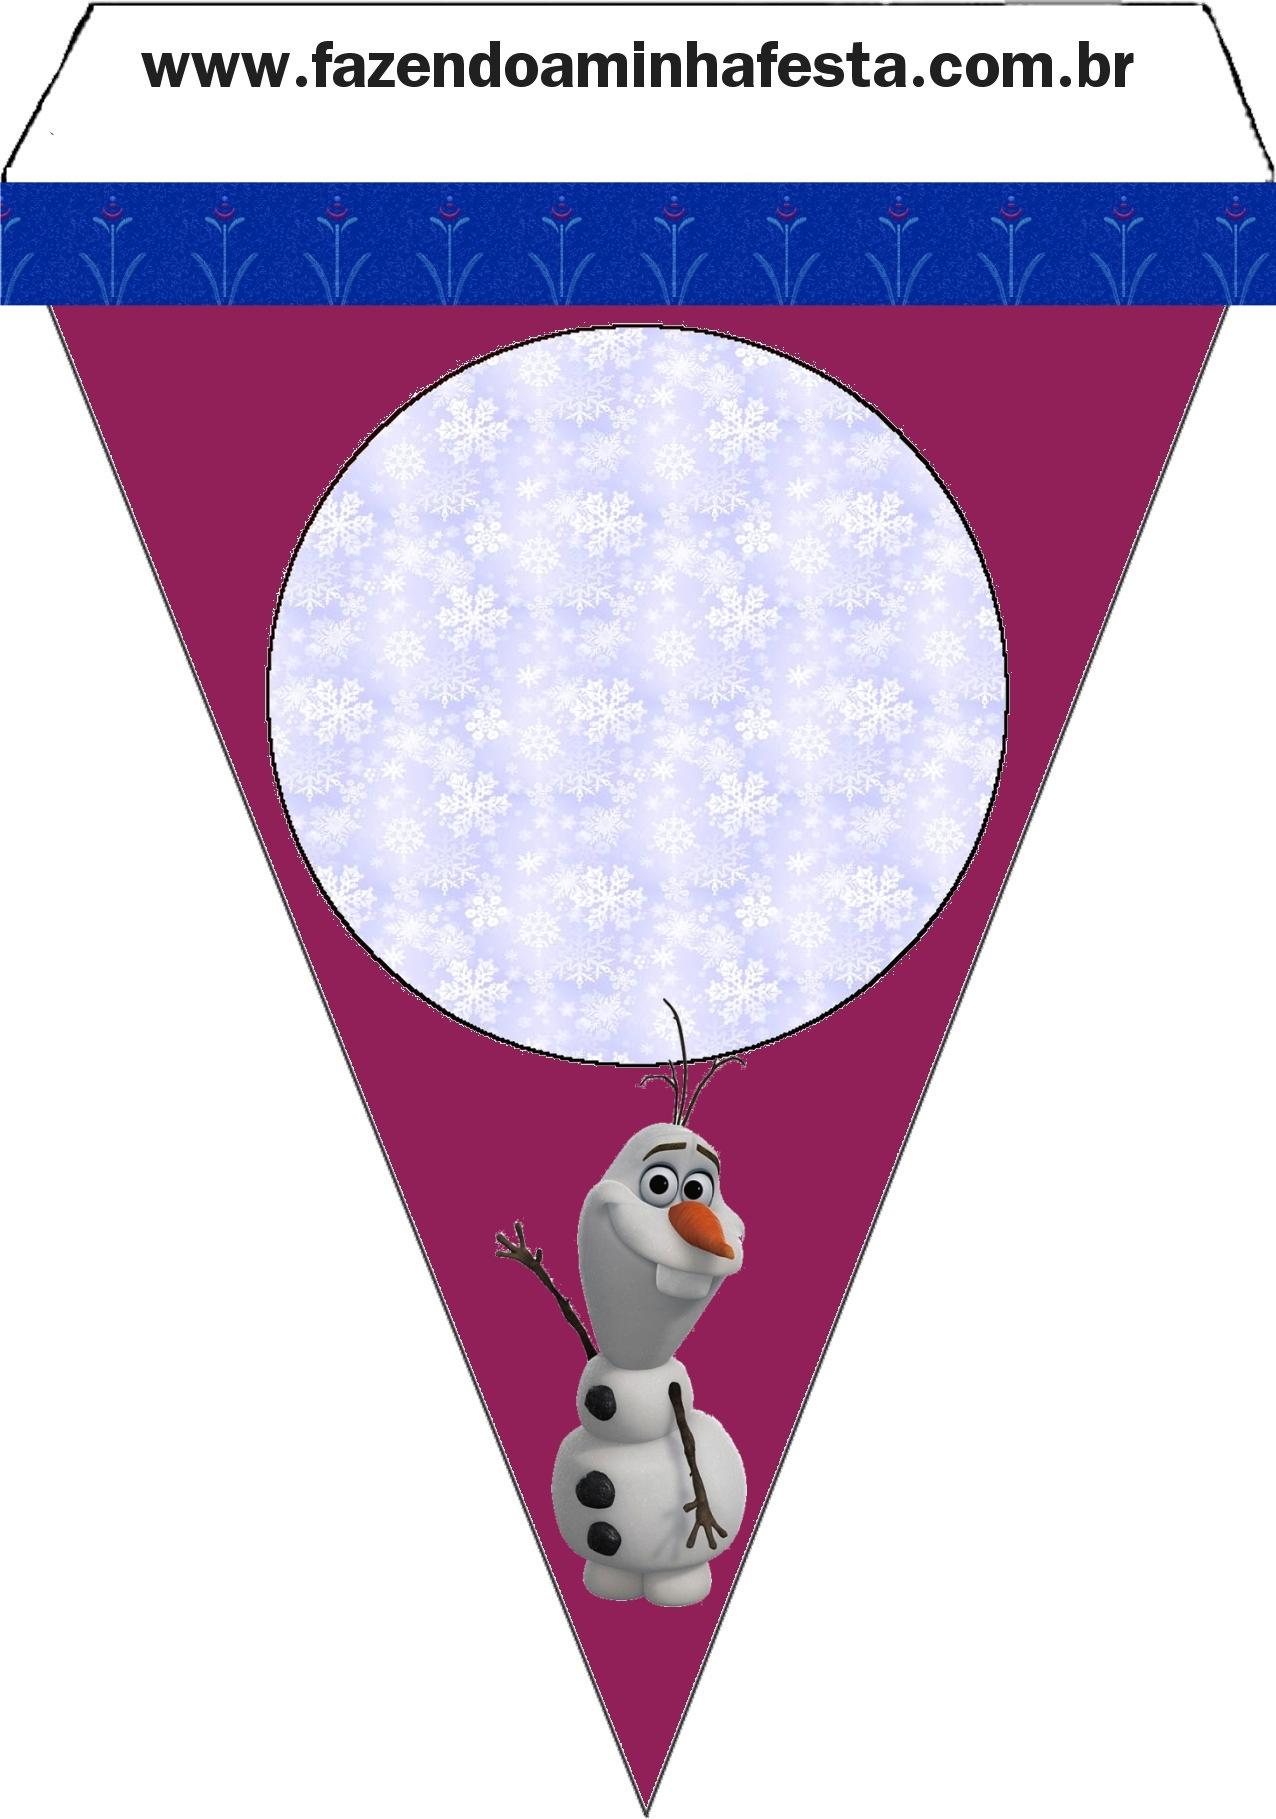 http://fazendoaminhafesta.com.br/2014/05/kit-frozen.html